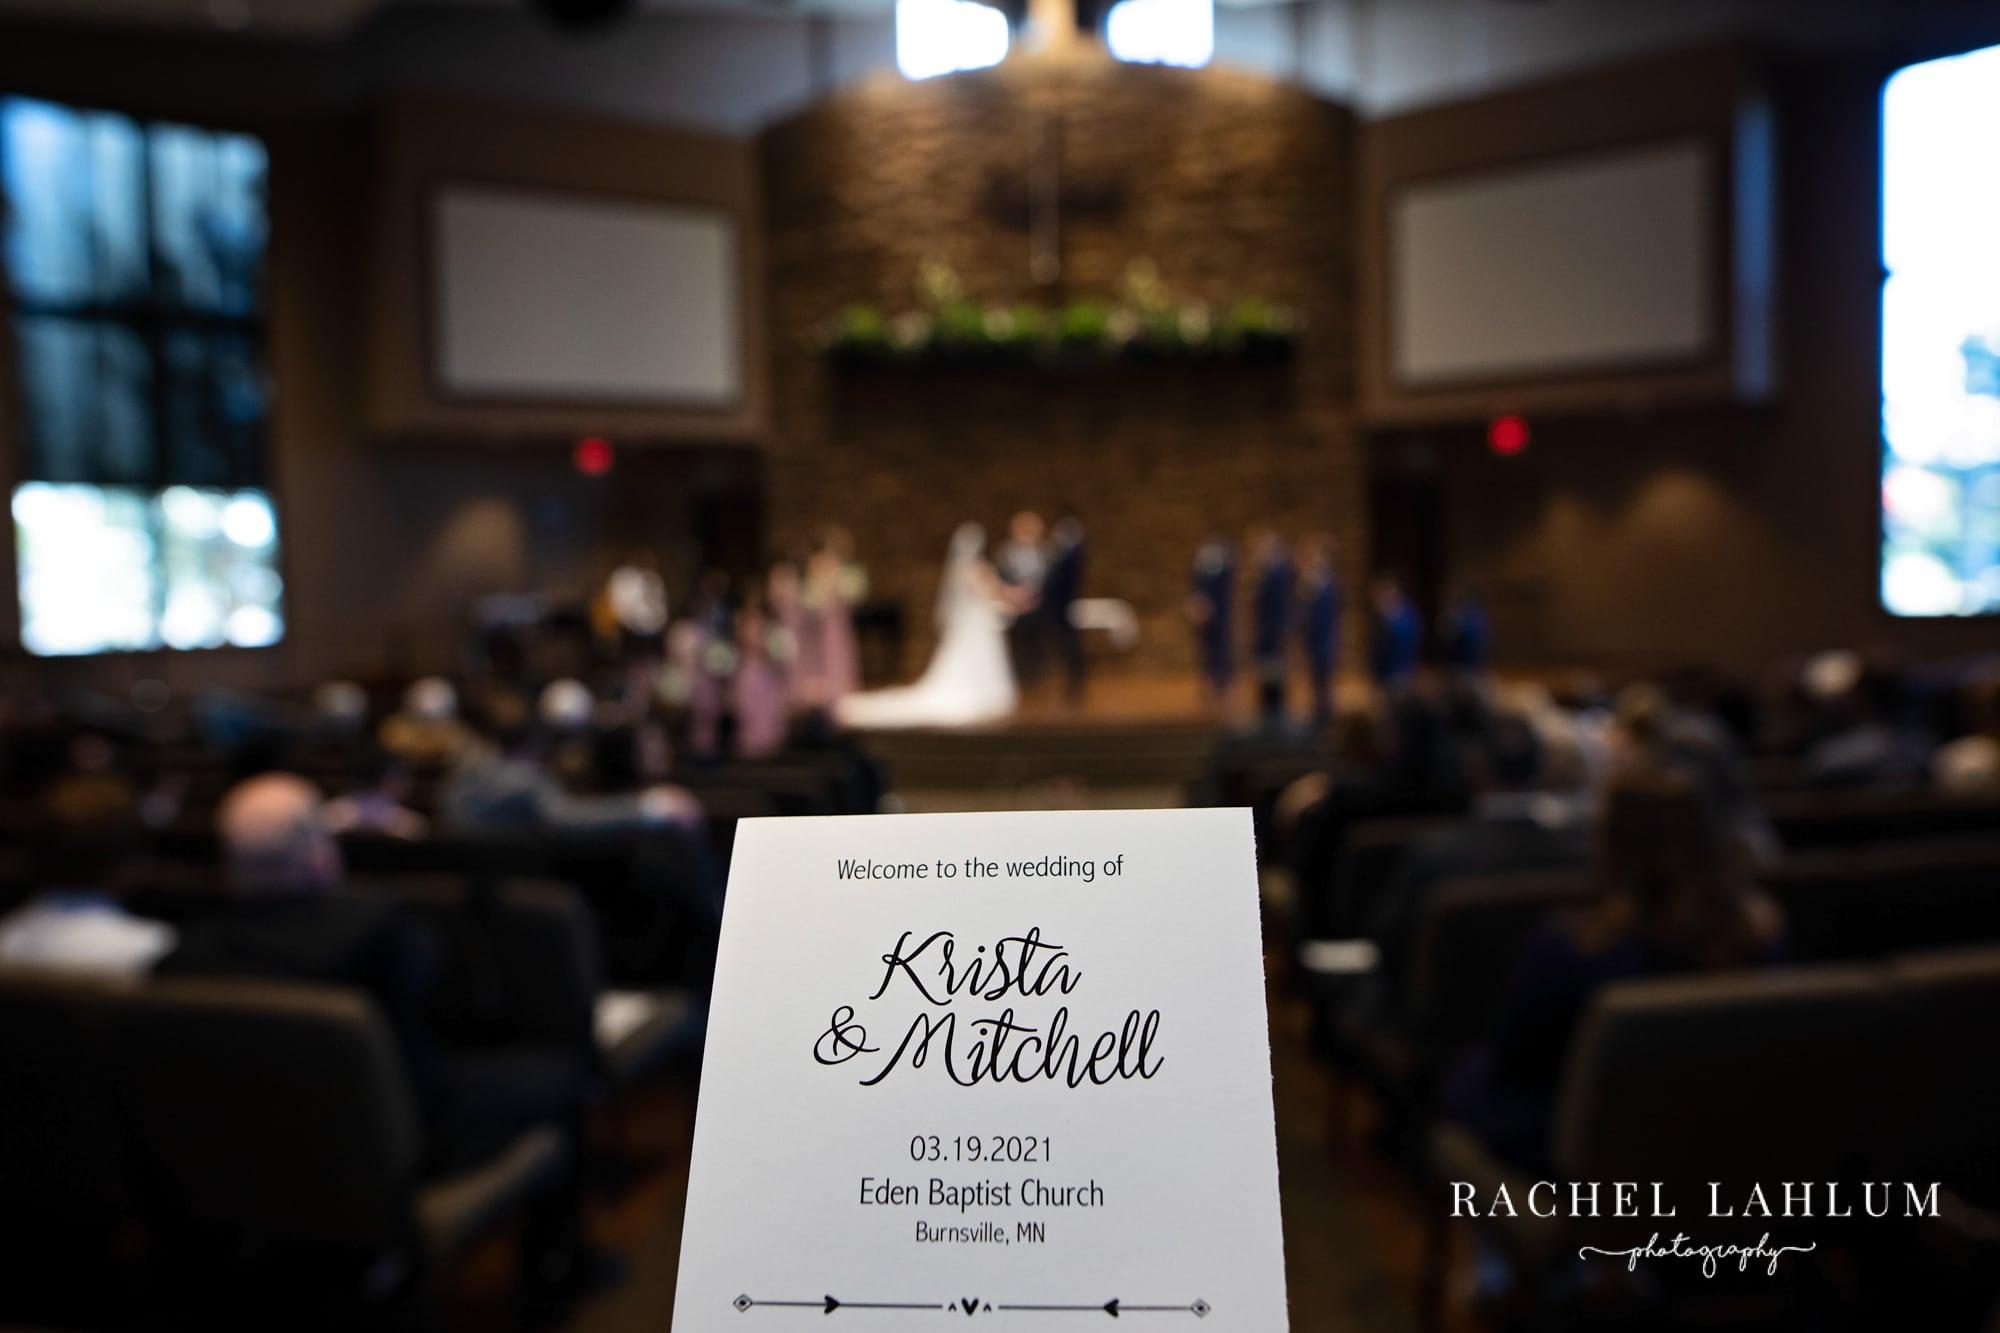 Welcome program in front of Wedding ceremony at Eden Baptist Church in Burnsville, Minnesota.